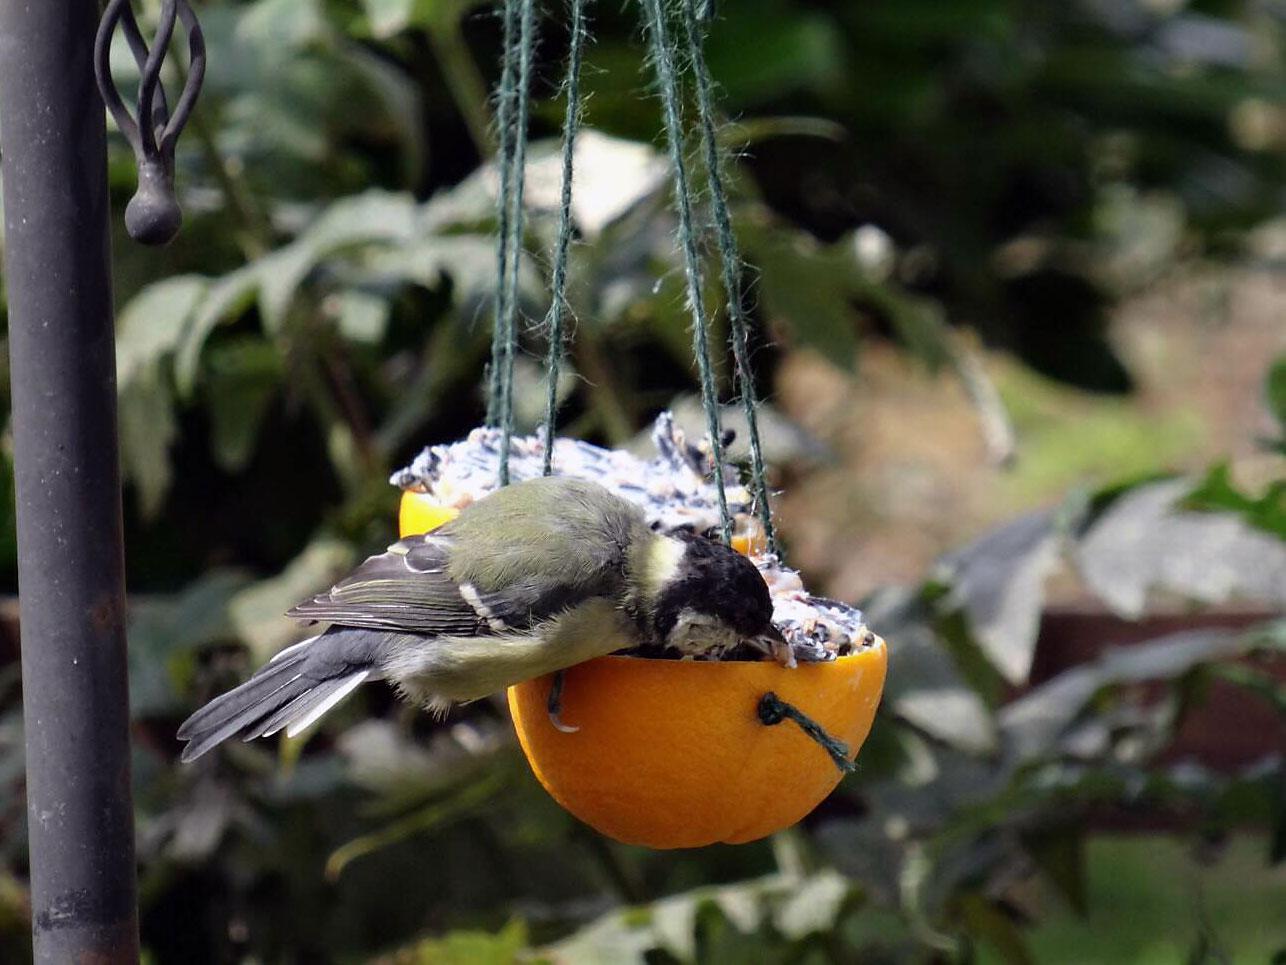 A bird eating bird cake